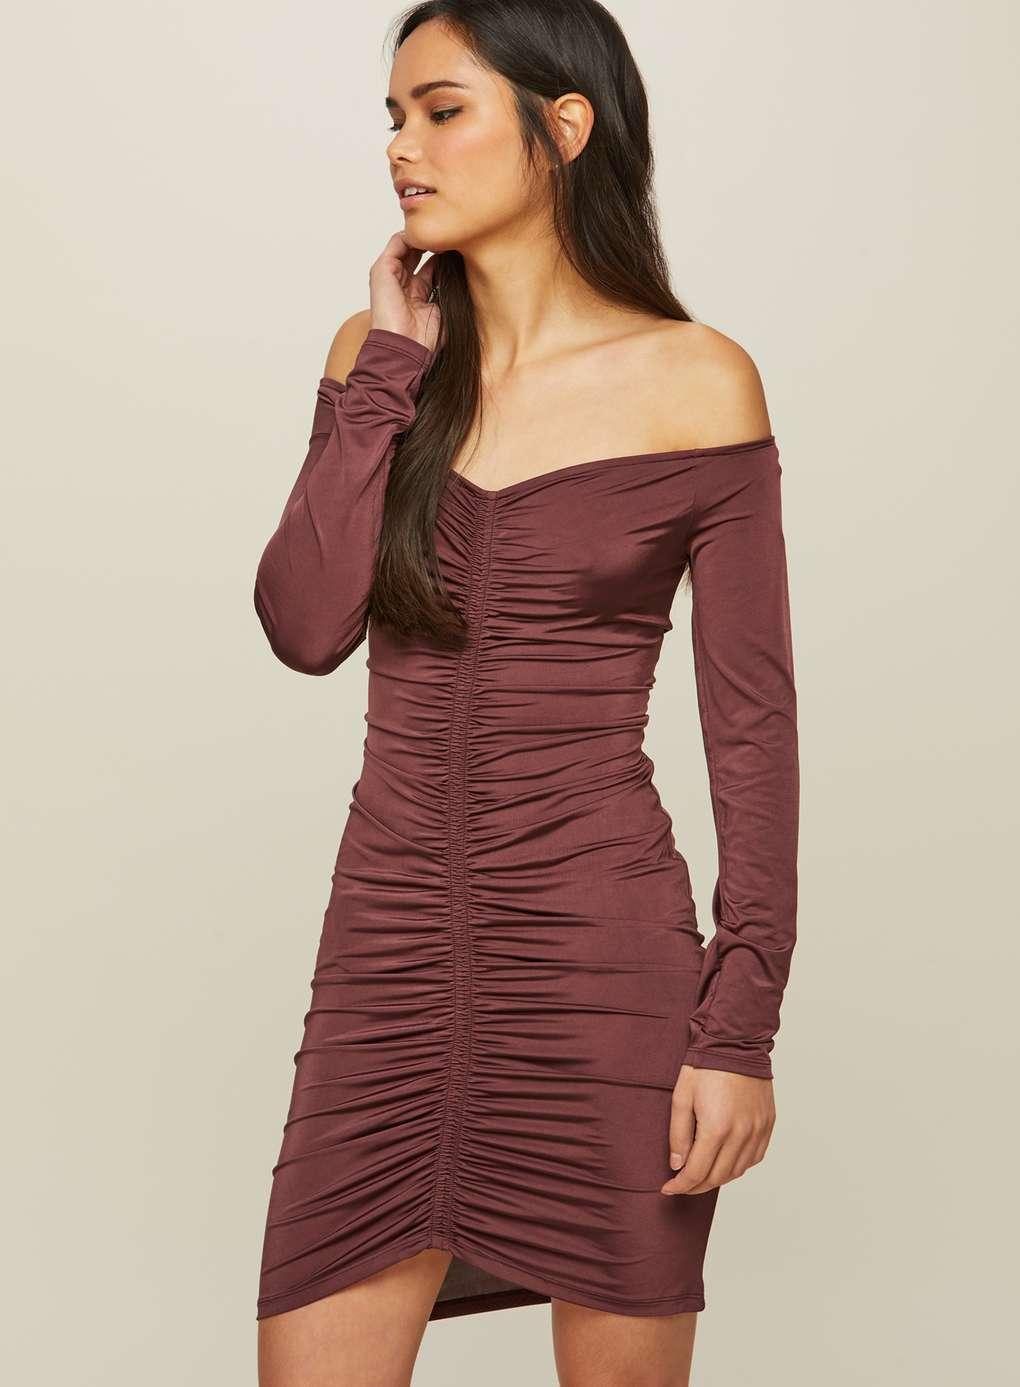 Burgundy Ruched Bodycon Dress | Hermosaz